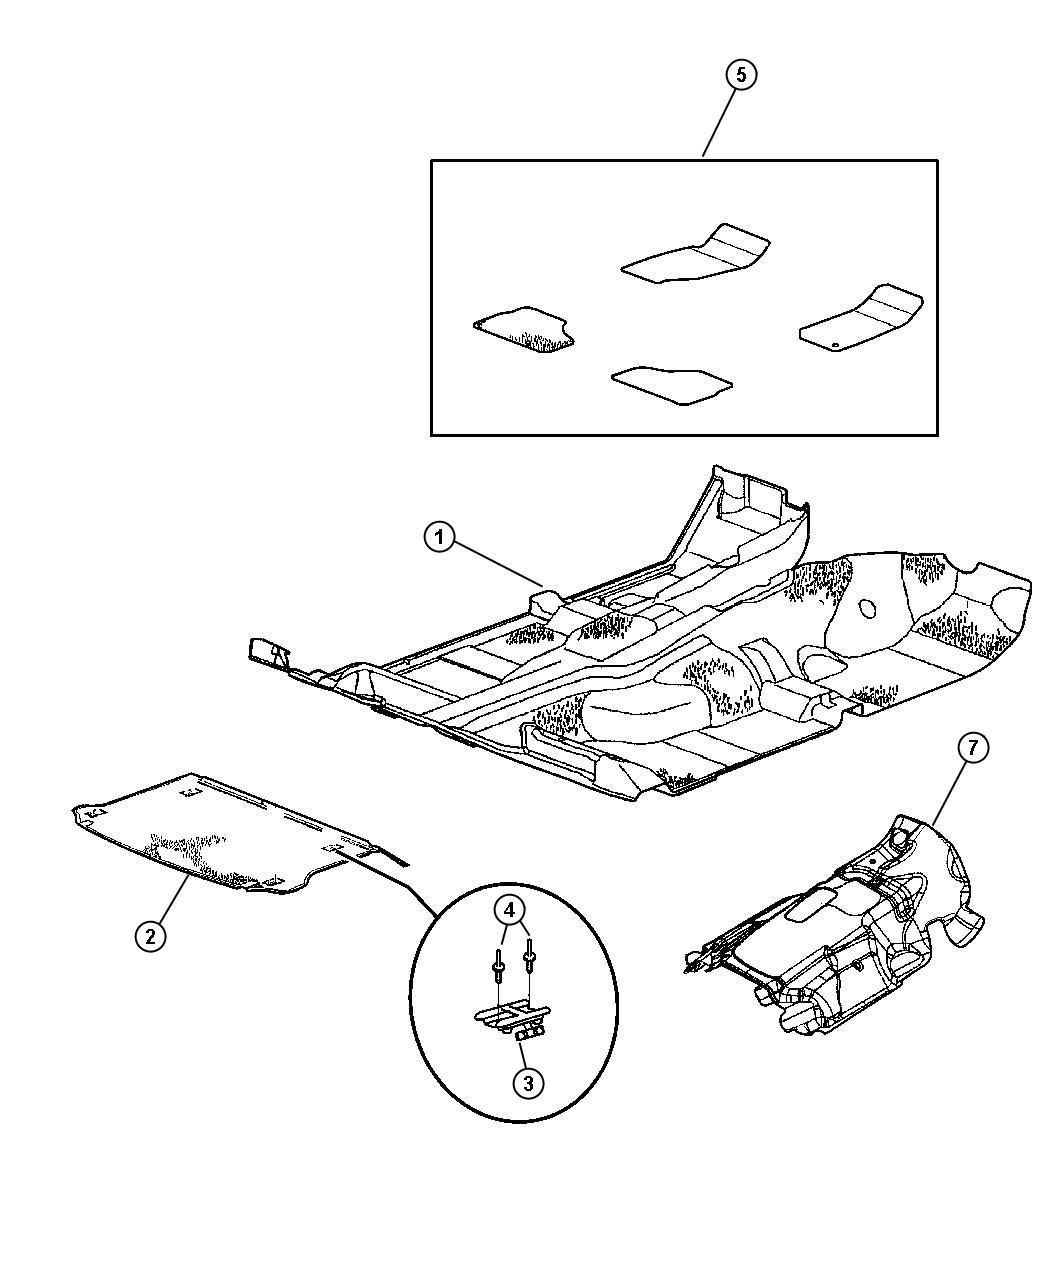 2011 Jeep Liberty Shield. Exhaust, floor pan. Muffler